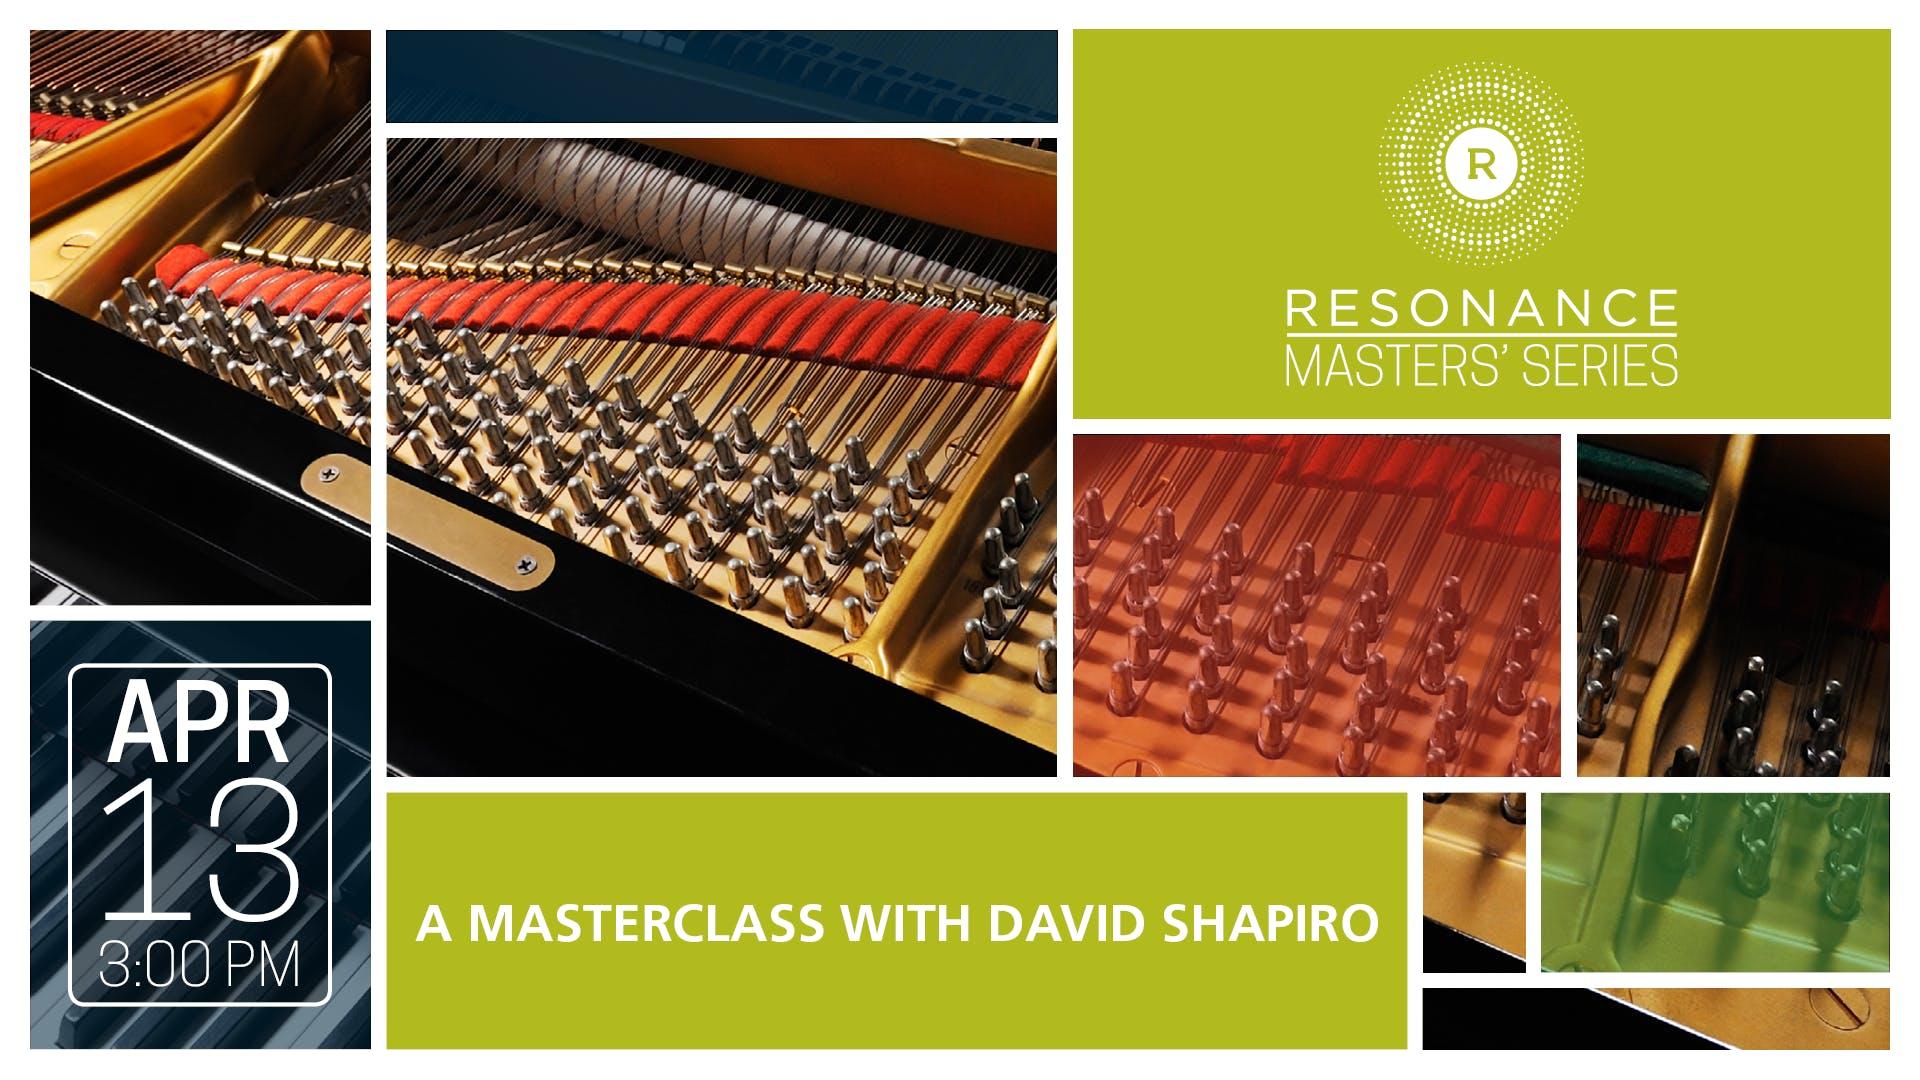 Resonance Masters' Series presents A MASTERCLASS WITH DANIEL SHAPIRO